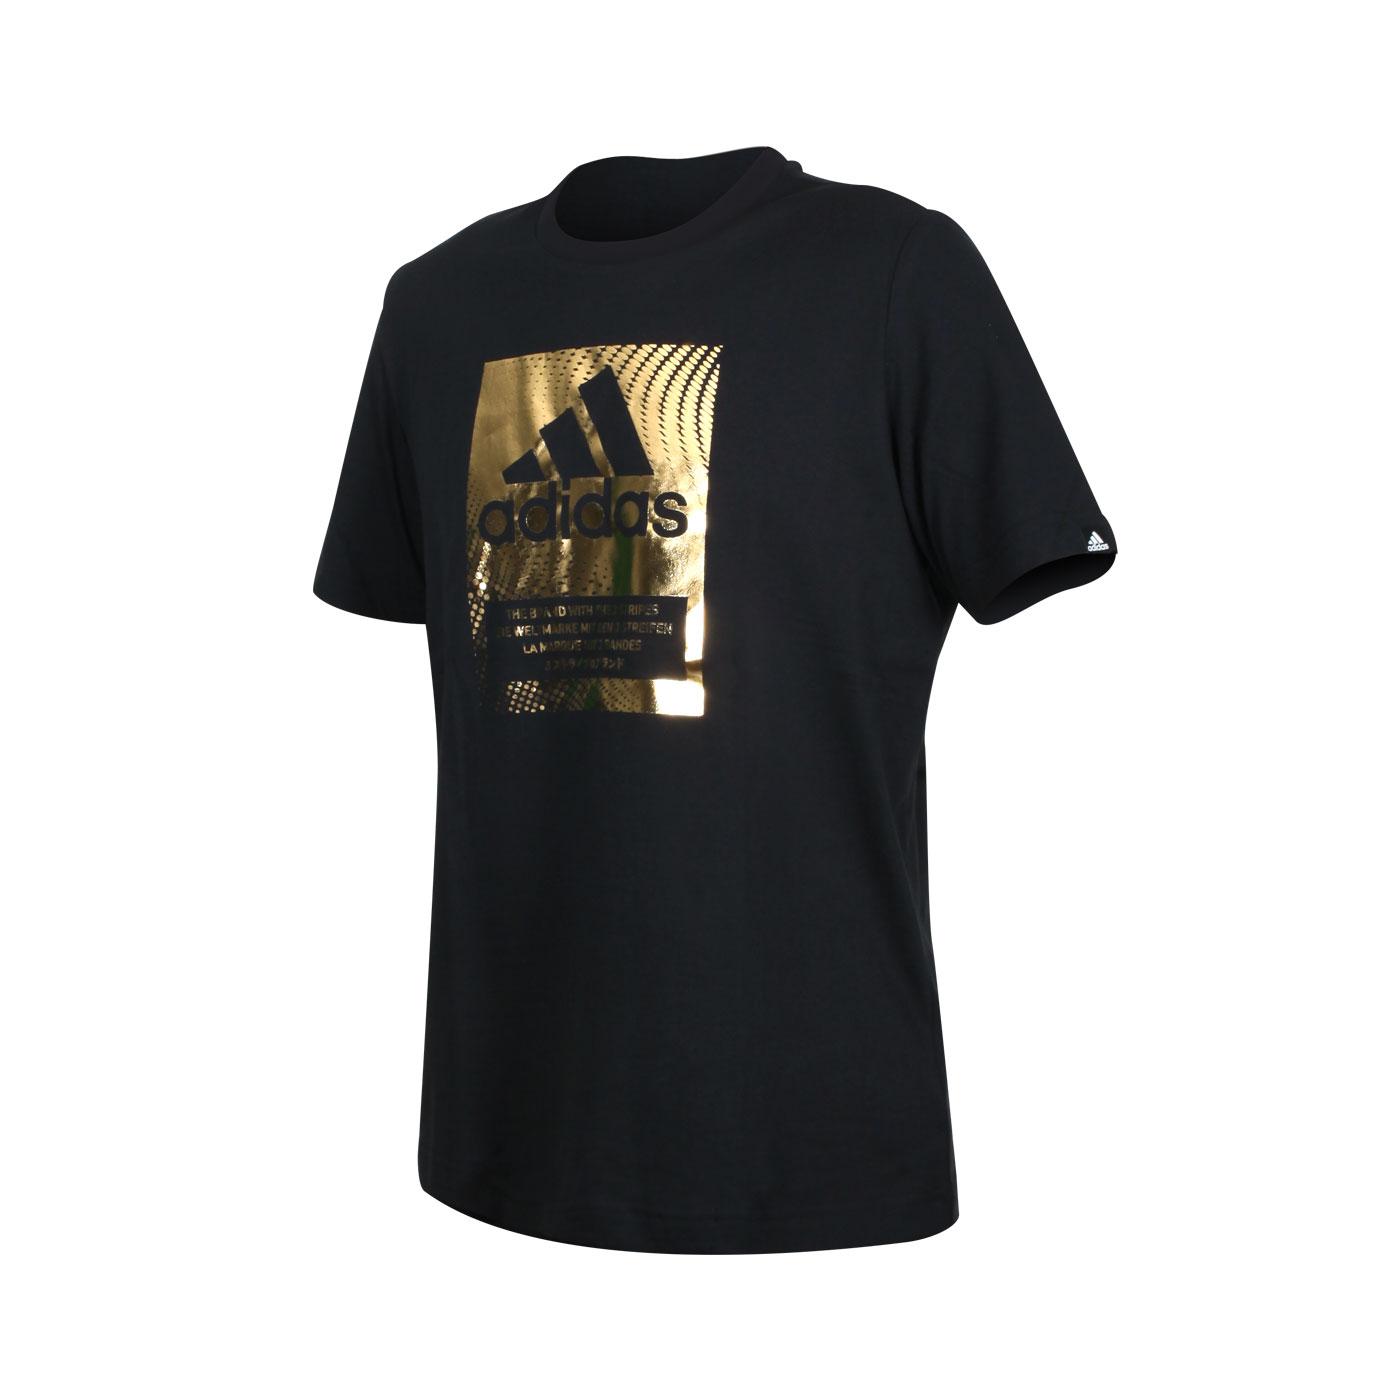 ADIDAS 男款短袖T恤 GS6316